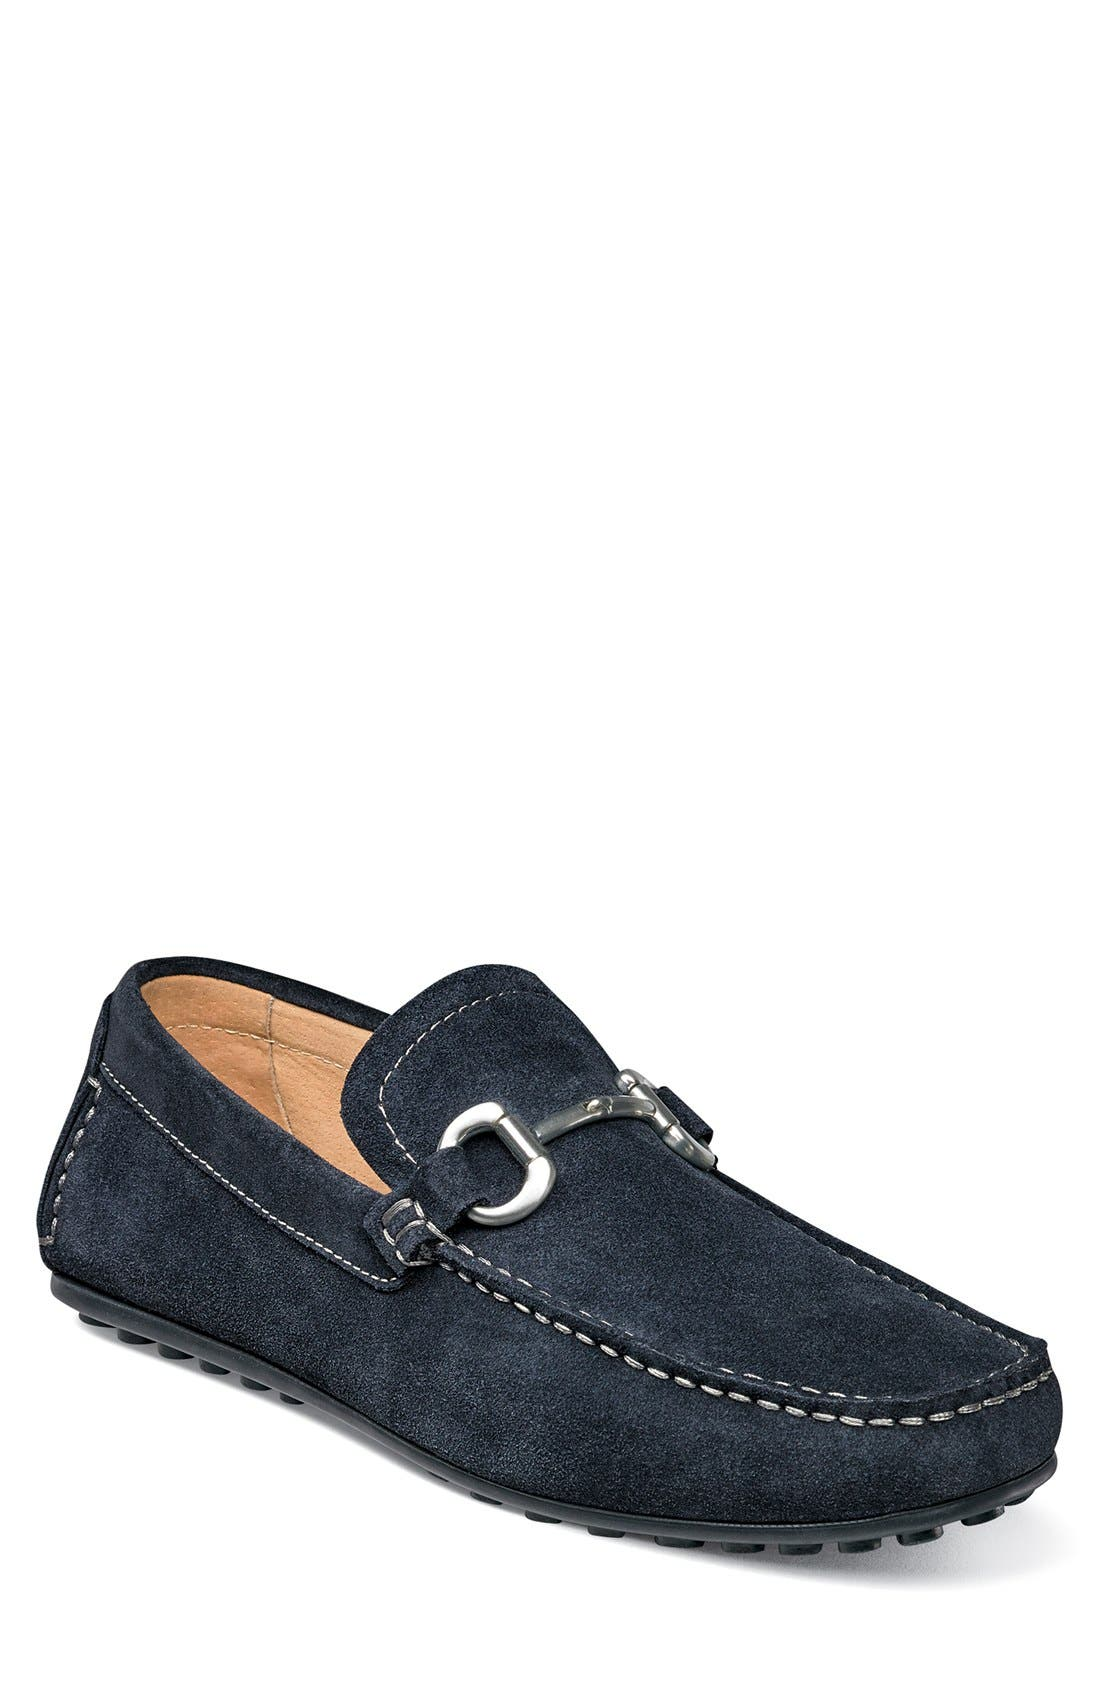 FLORSHEIM 'Danforth' Driving Shoe